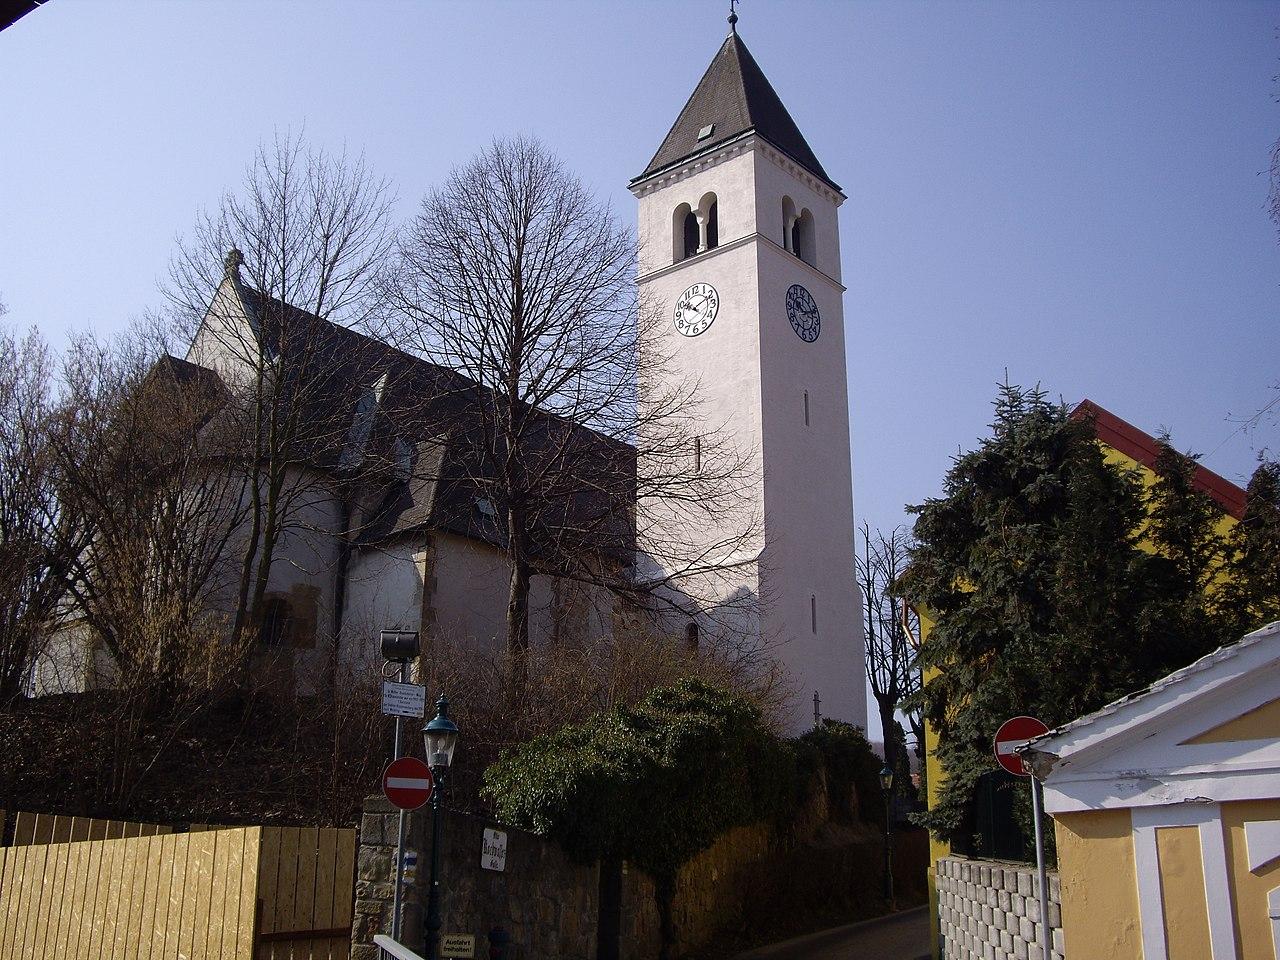 Pfarrkirche Kierling - menus2view.com